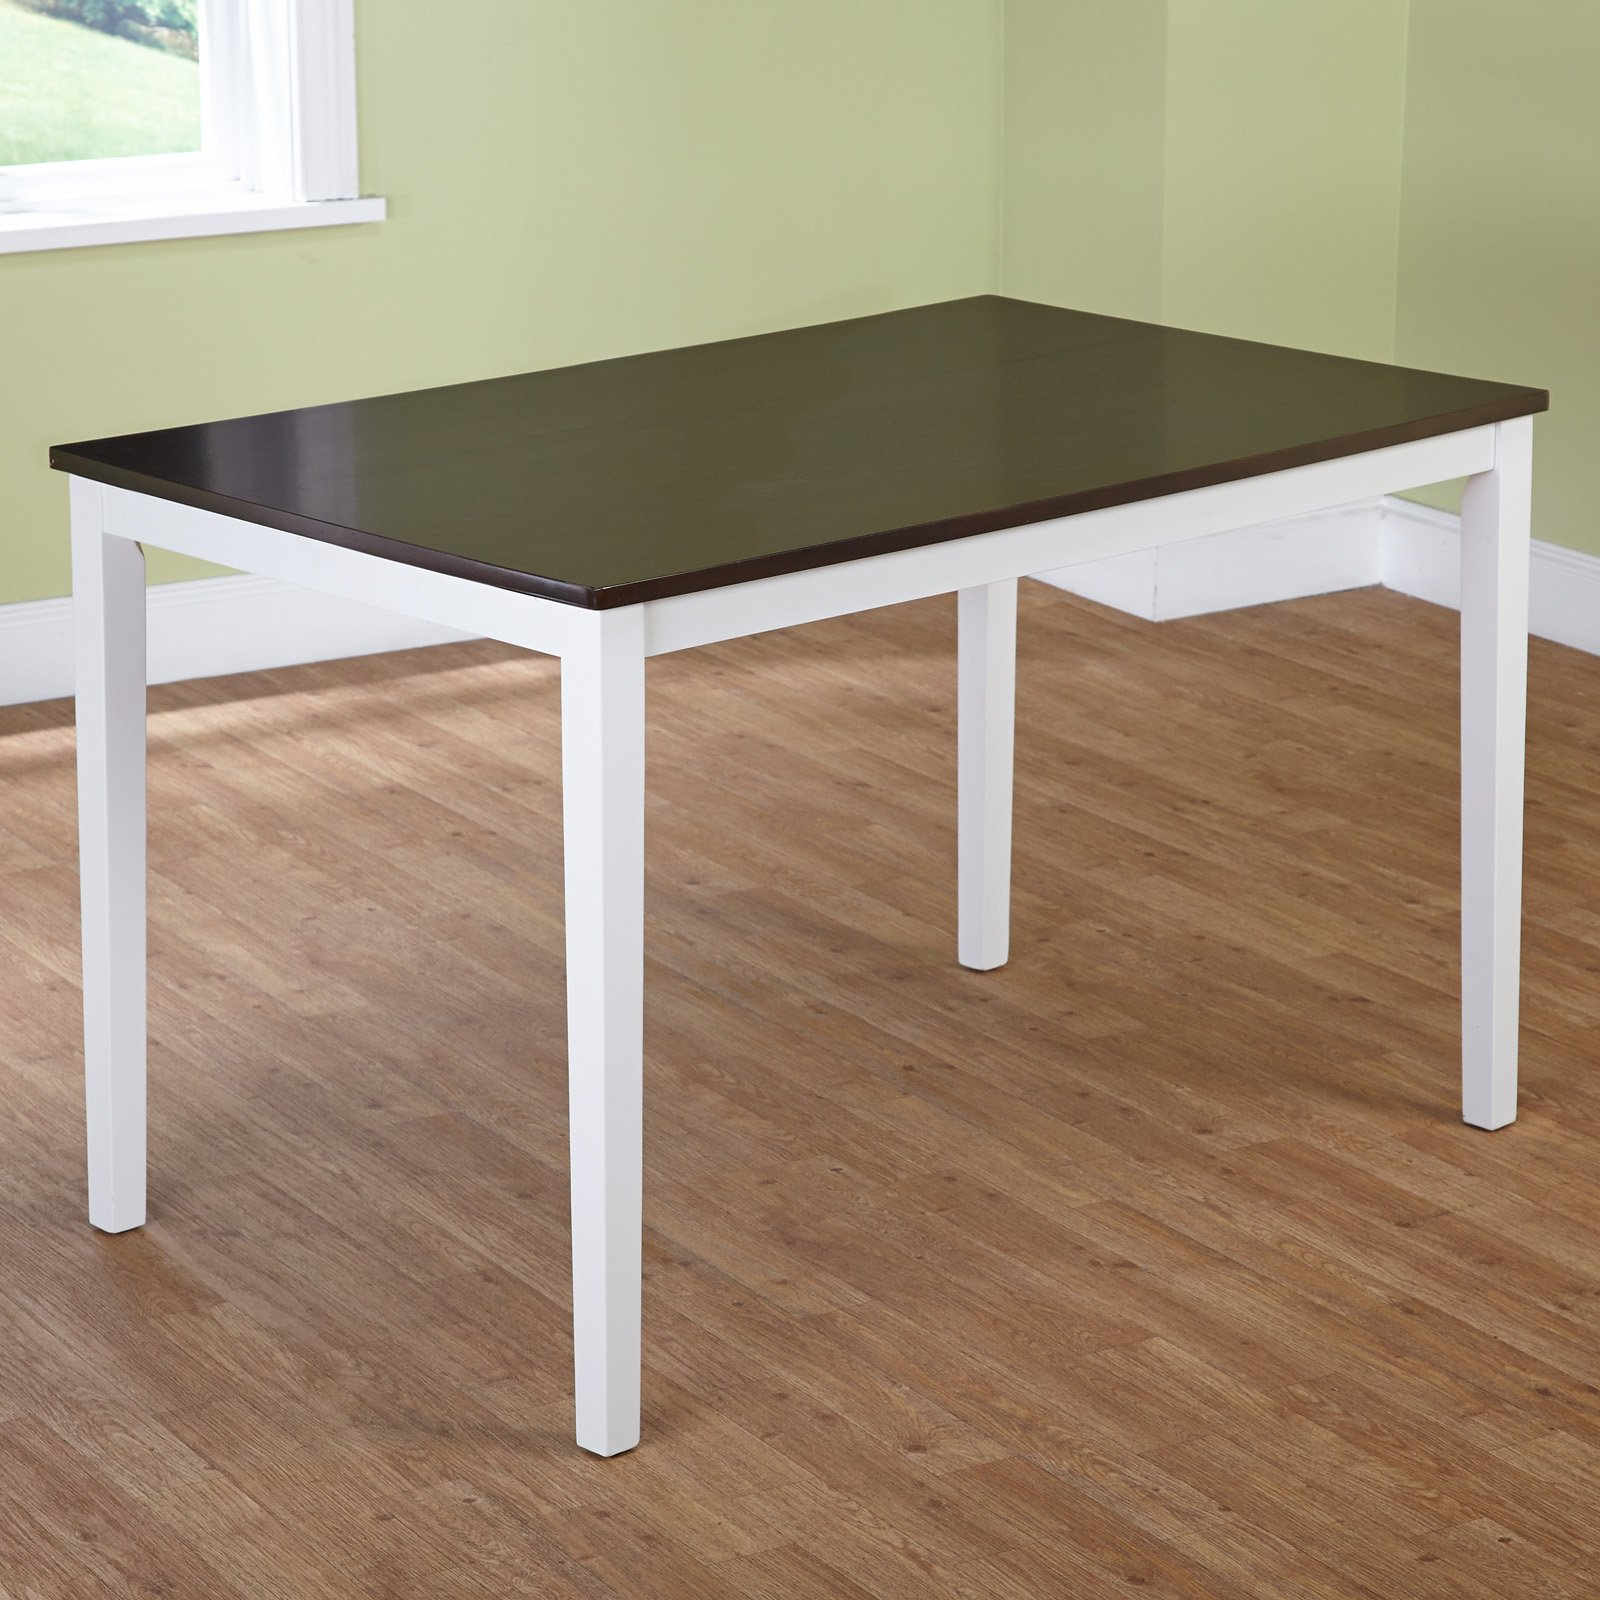 Eban 2-Tone Dining Table, White/Mocha